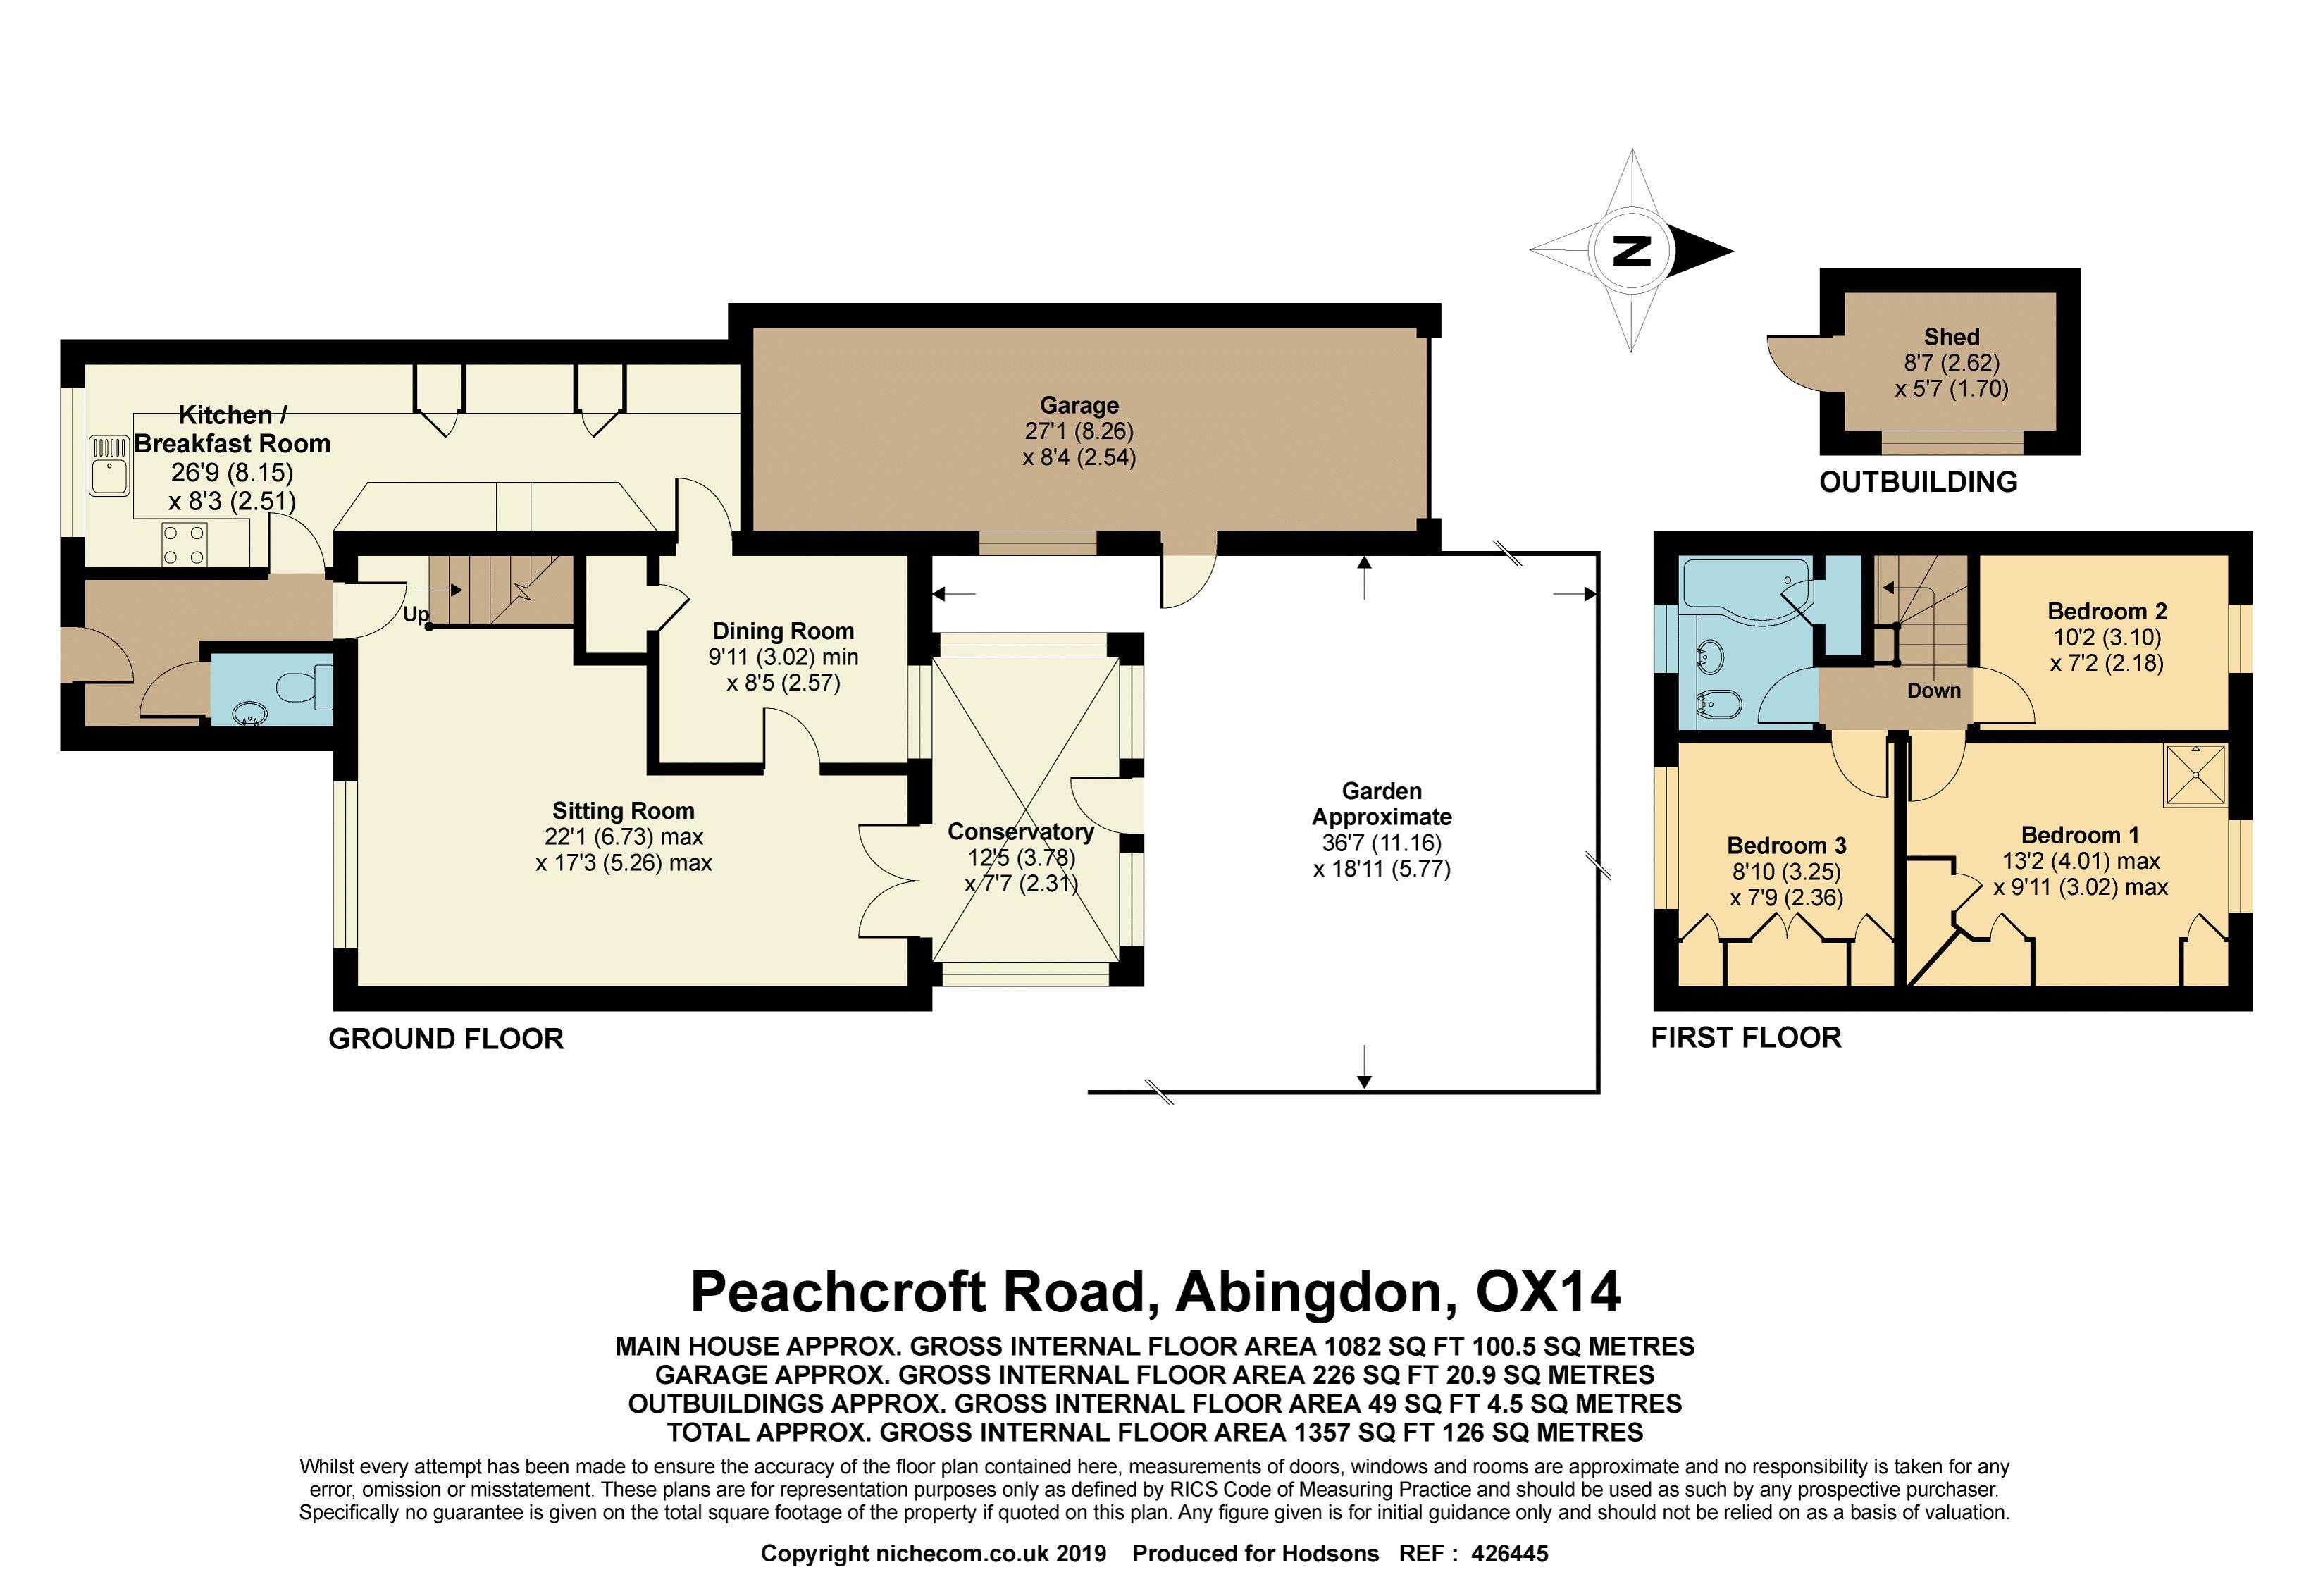 Peachcroft Road